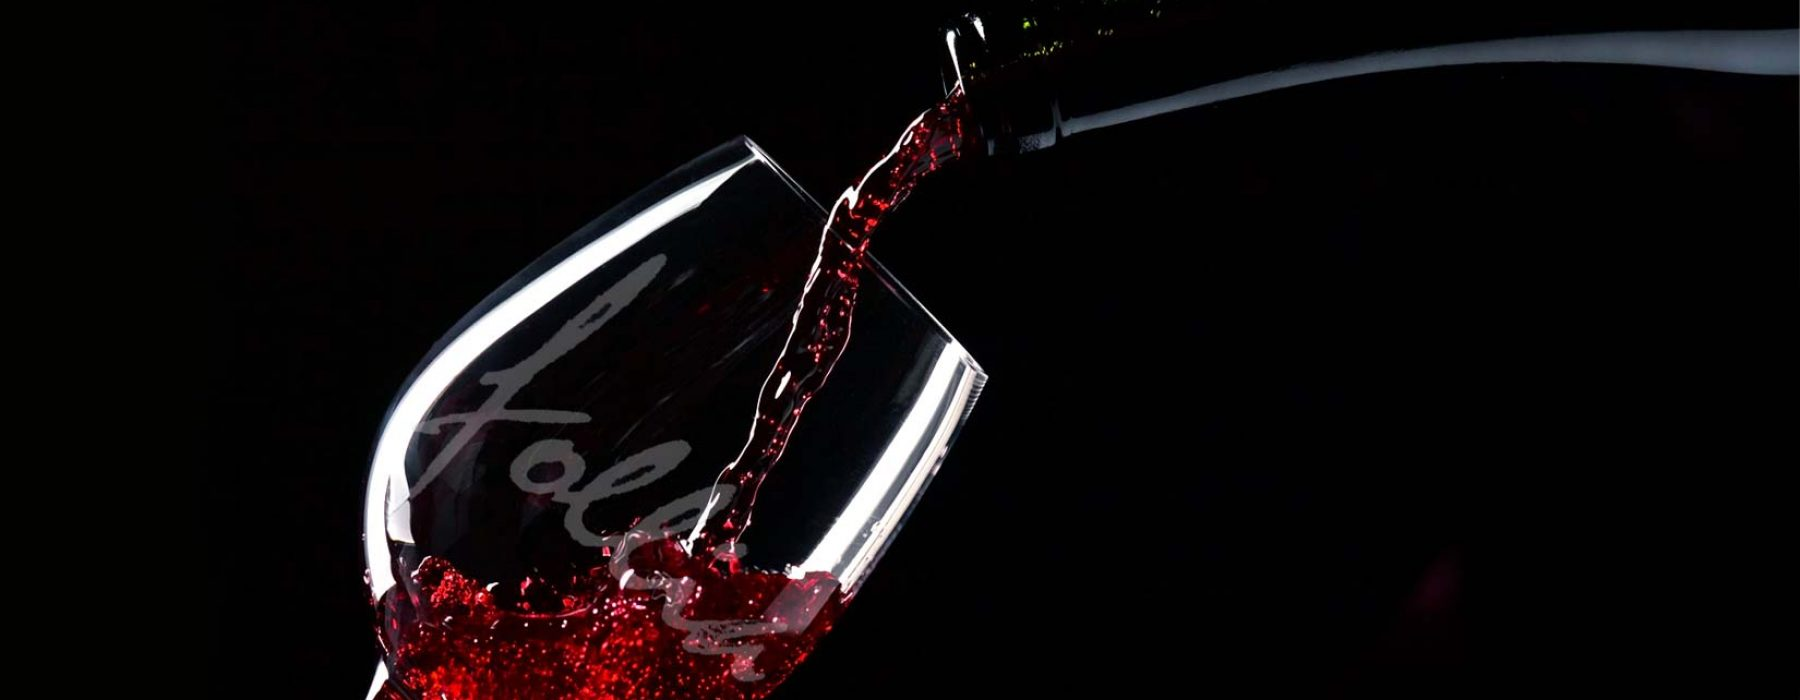 Piana dei Castelli: vinho por amor